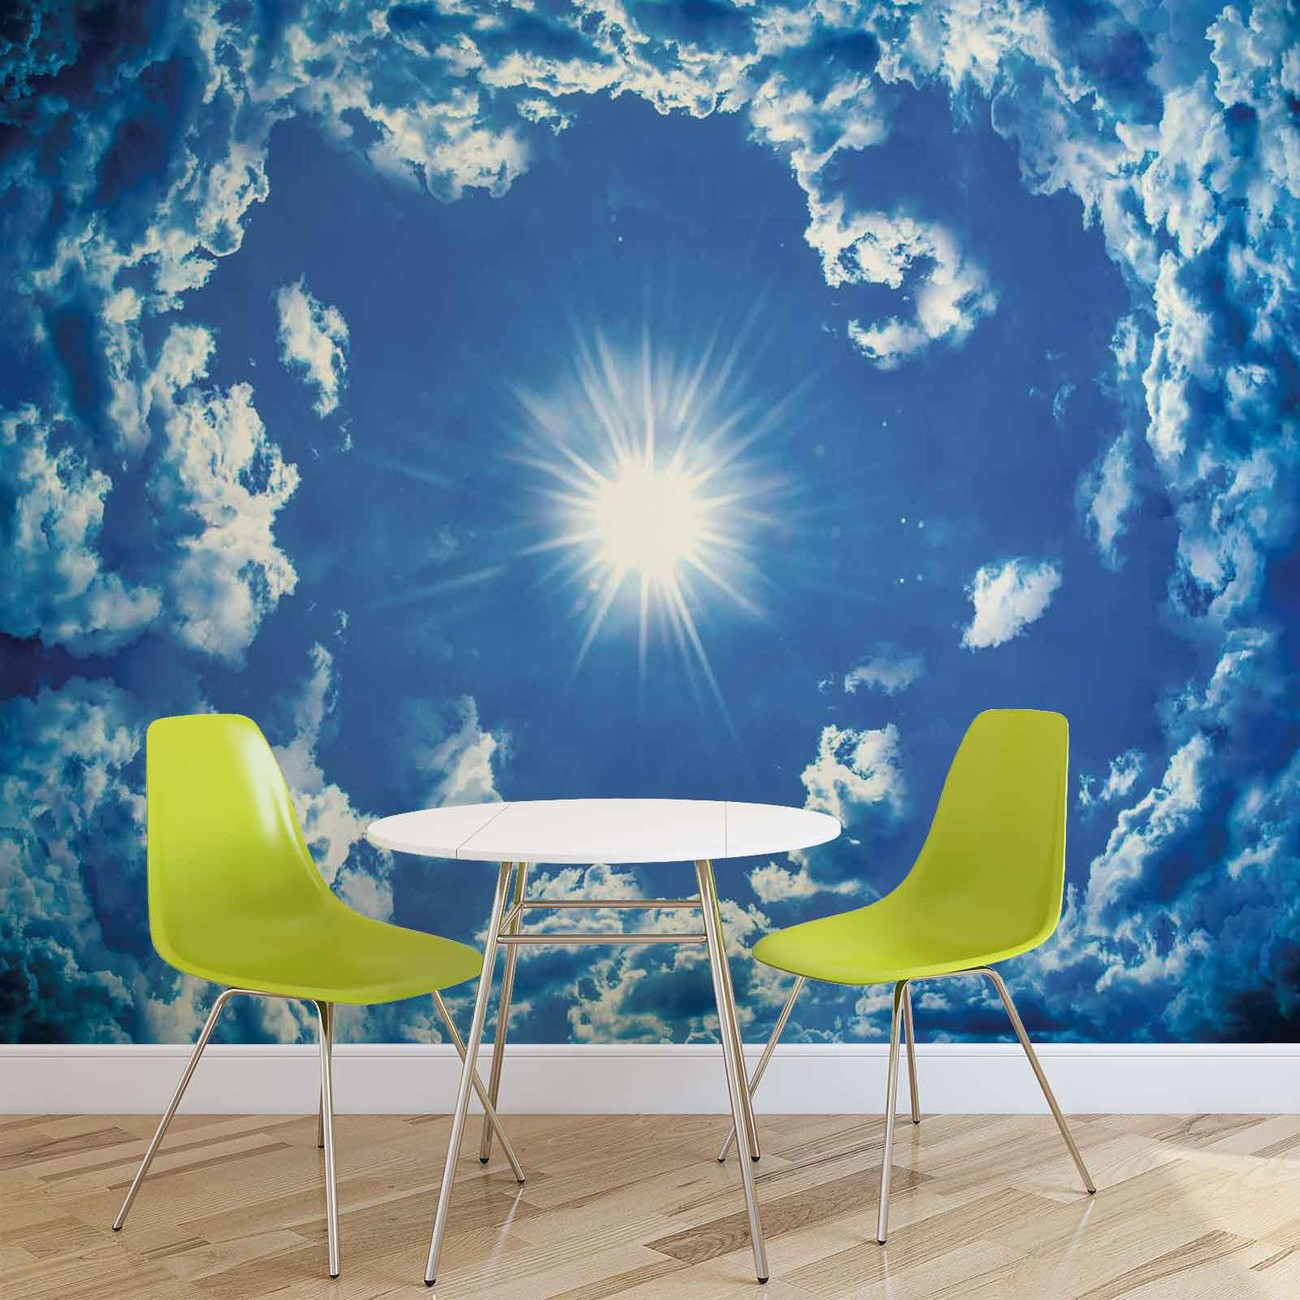 fototapete tapete himmel wolken sonne natur bei. Black Bedroom Furniture Sets. Home Design Ideas